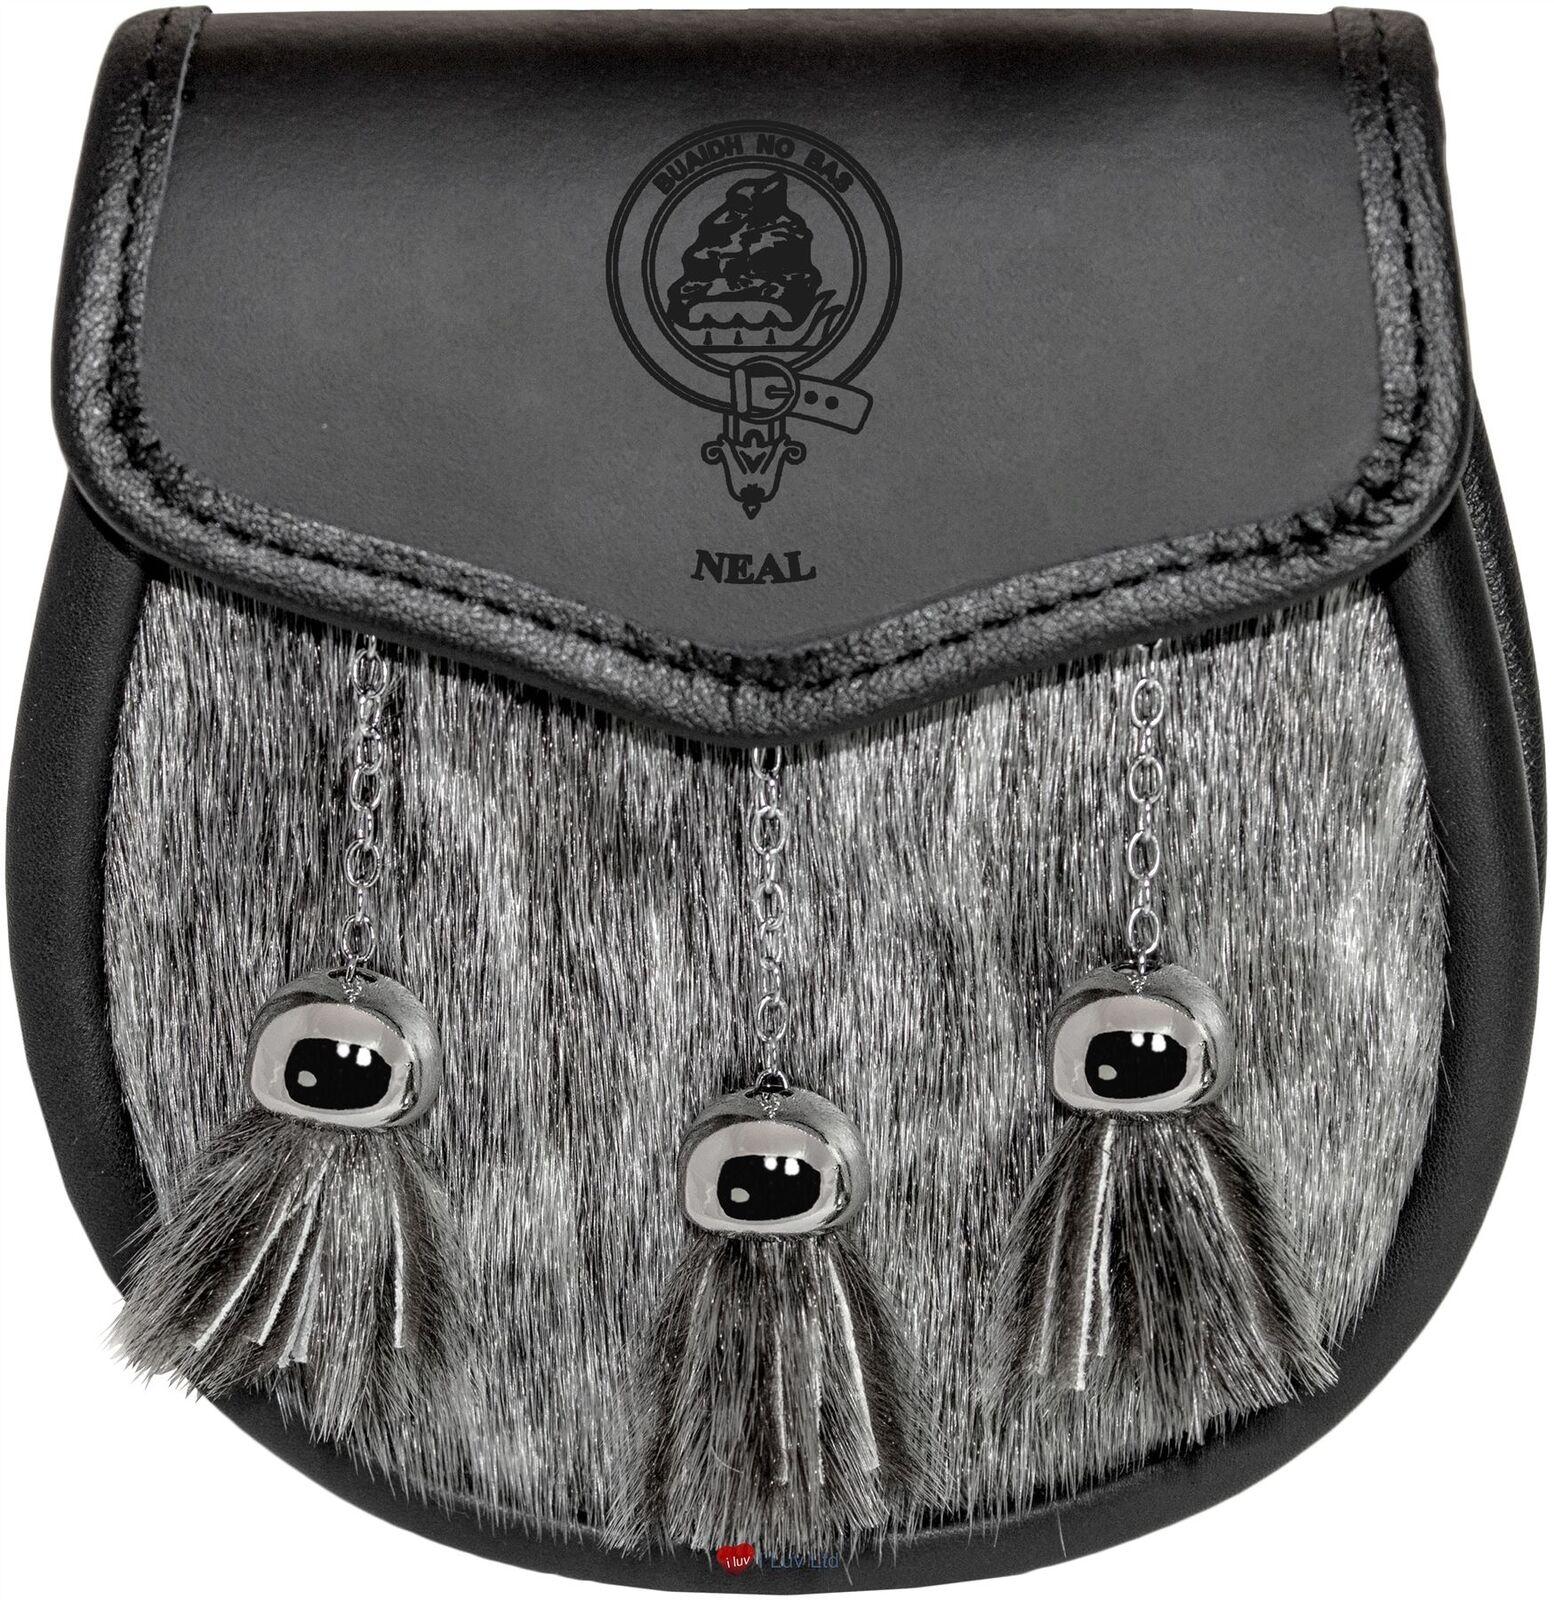 Neal Semi Dress Sporran Fur Plain Leather Flap Scottish Clan Crest